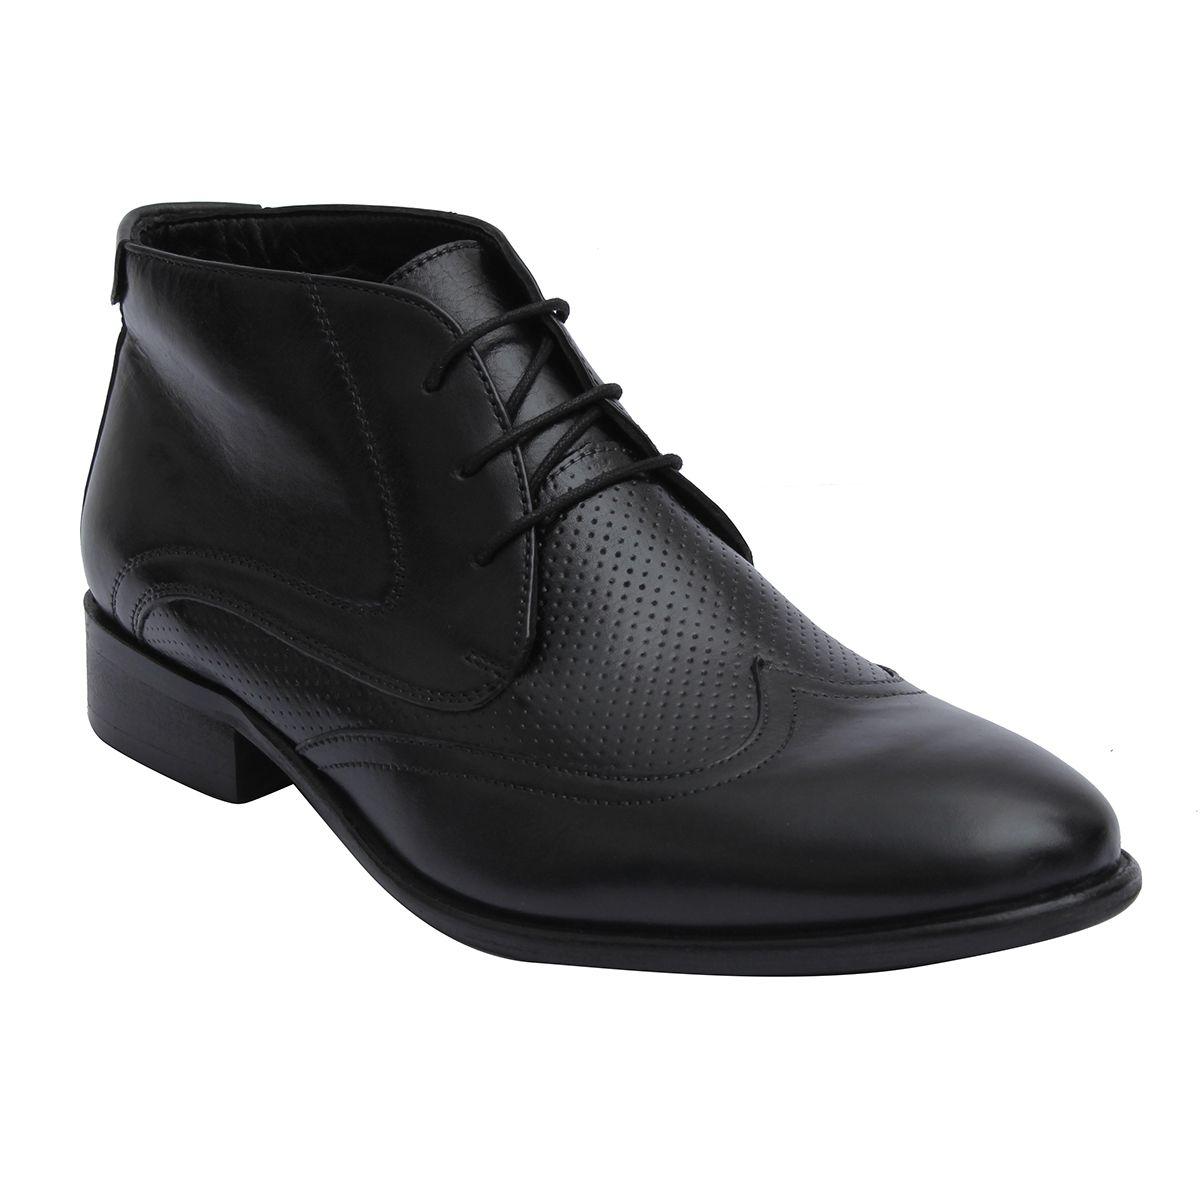 Salt N Pepper Black Boots